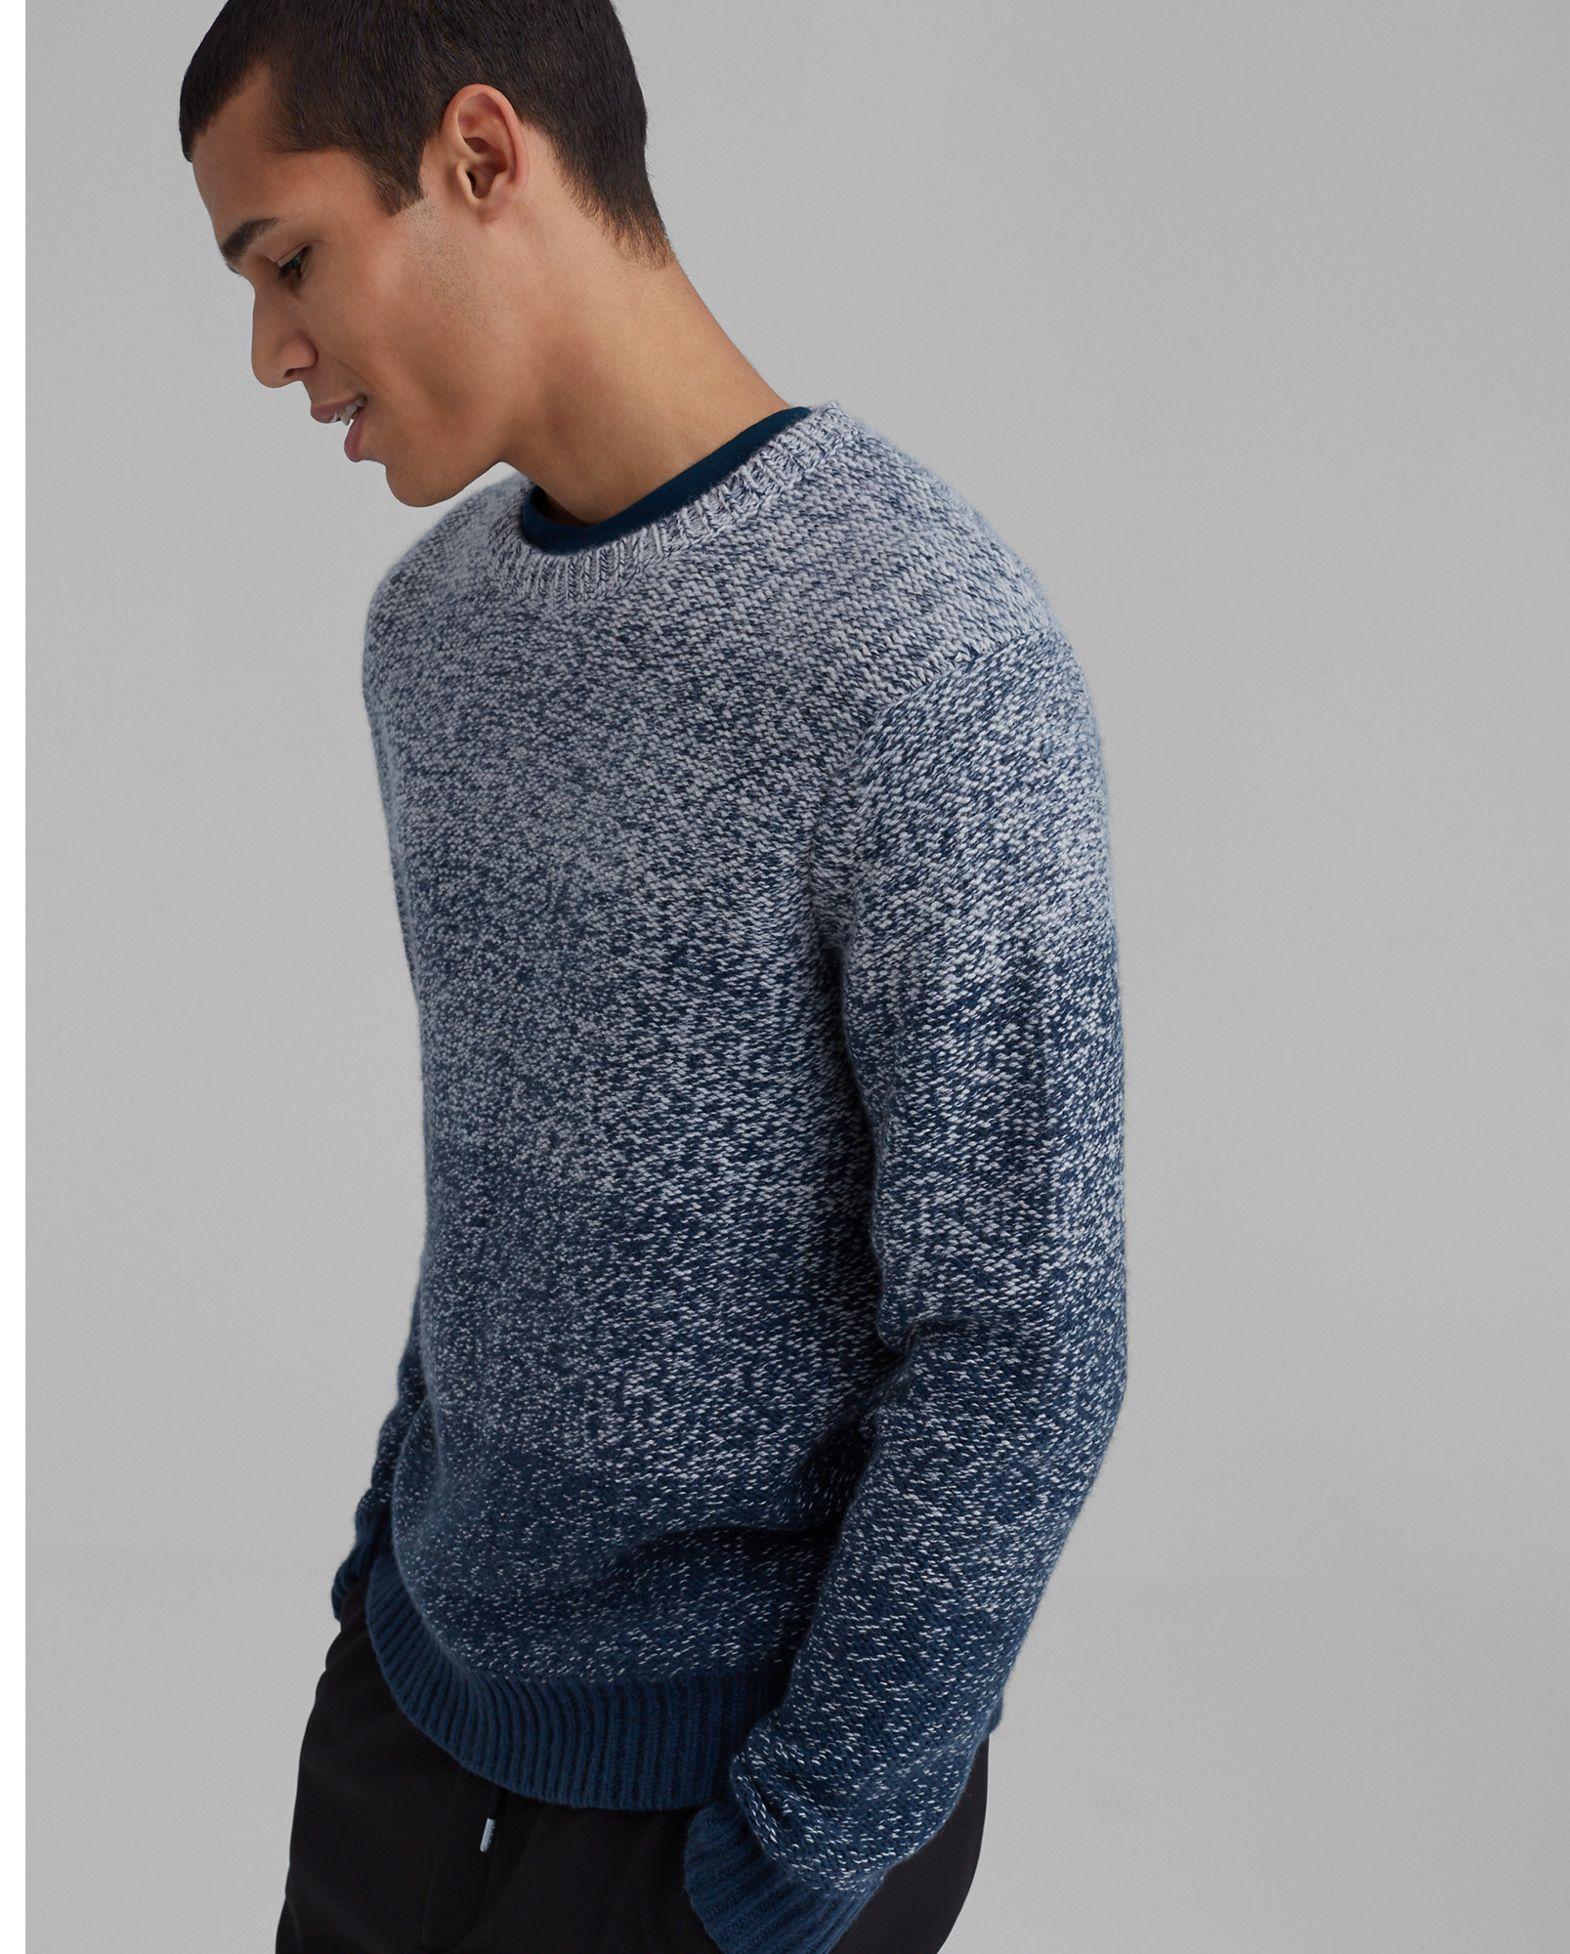 CLUB MONACO Cashmere Gradient Crewneck Sweater